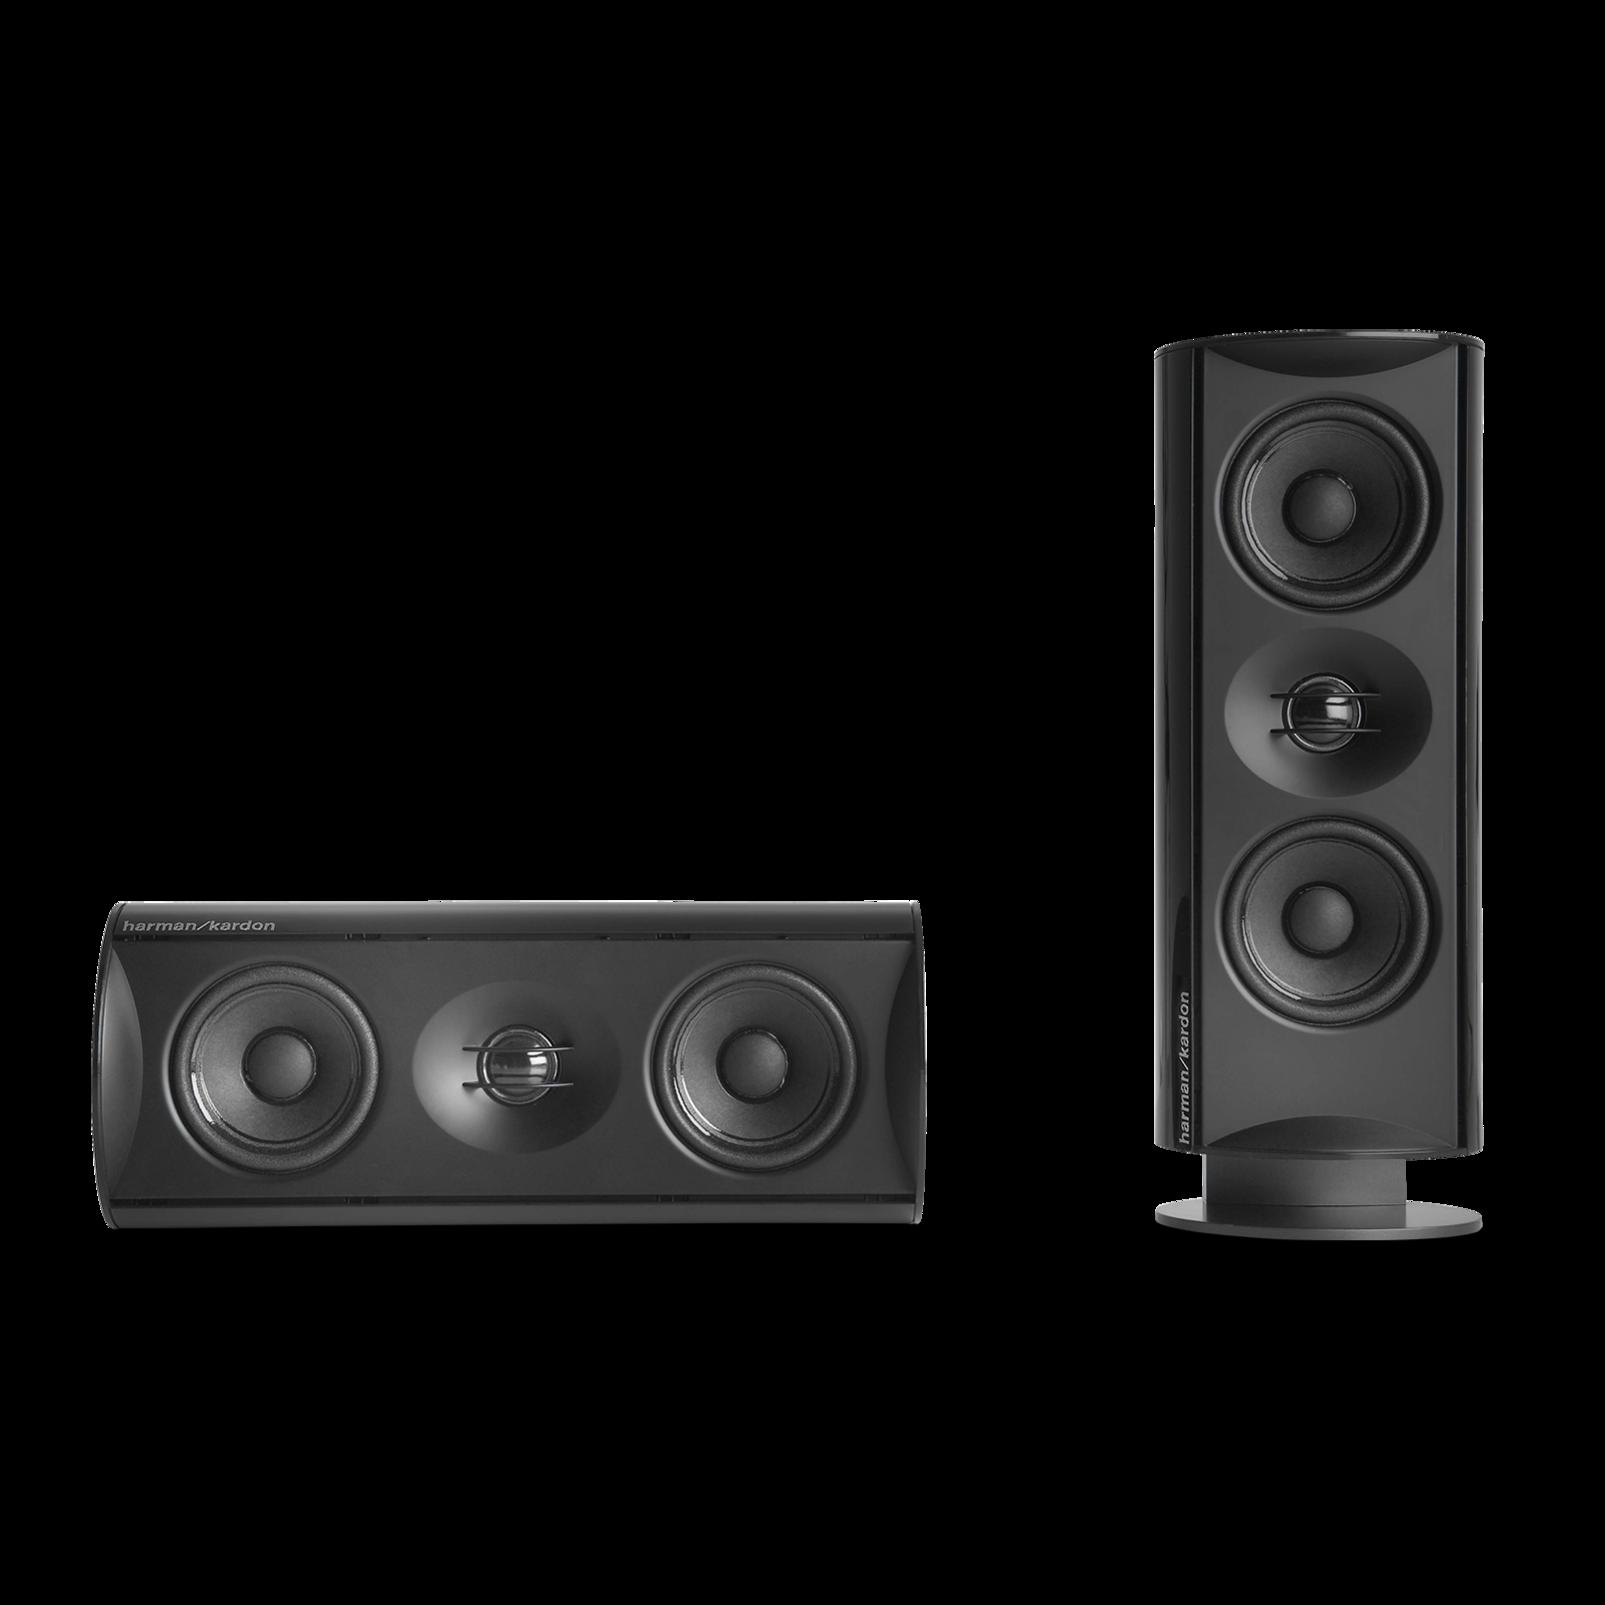 soundbar oder heimkino interesting soundbar oder heimkino with soundbar oder heimkino oder. Black Bedroom Furniture Sets. Home Design Ideas